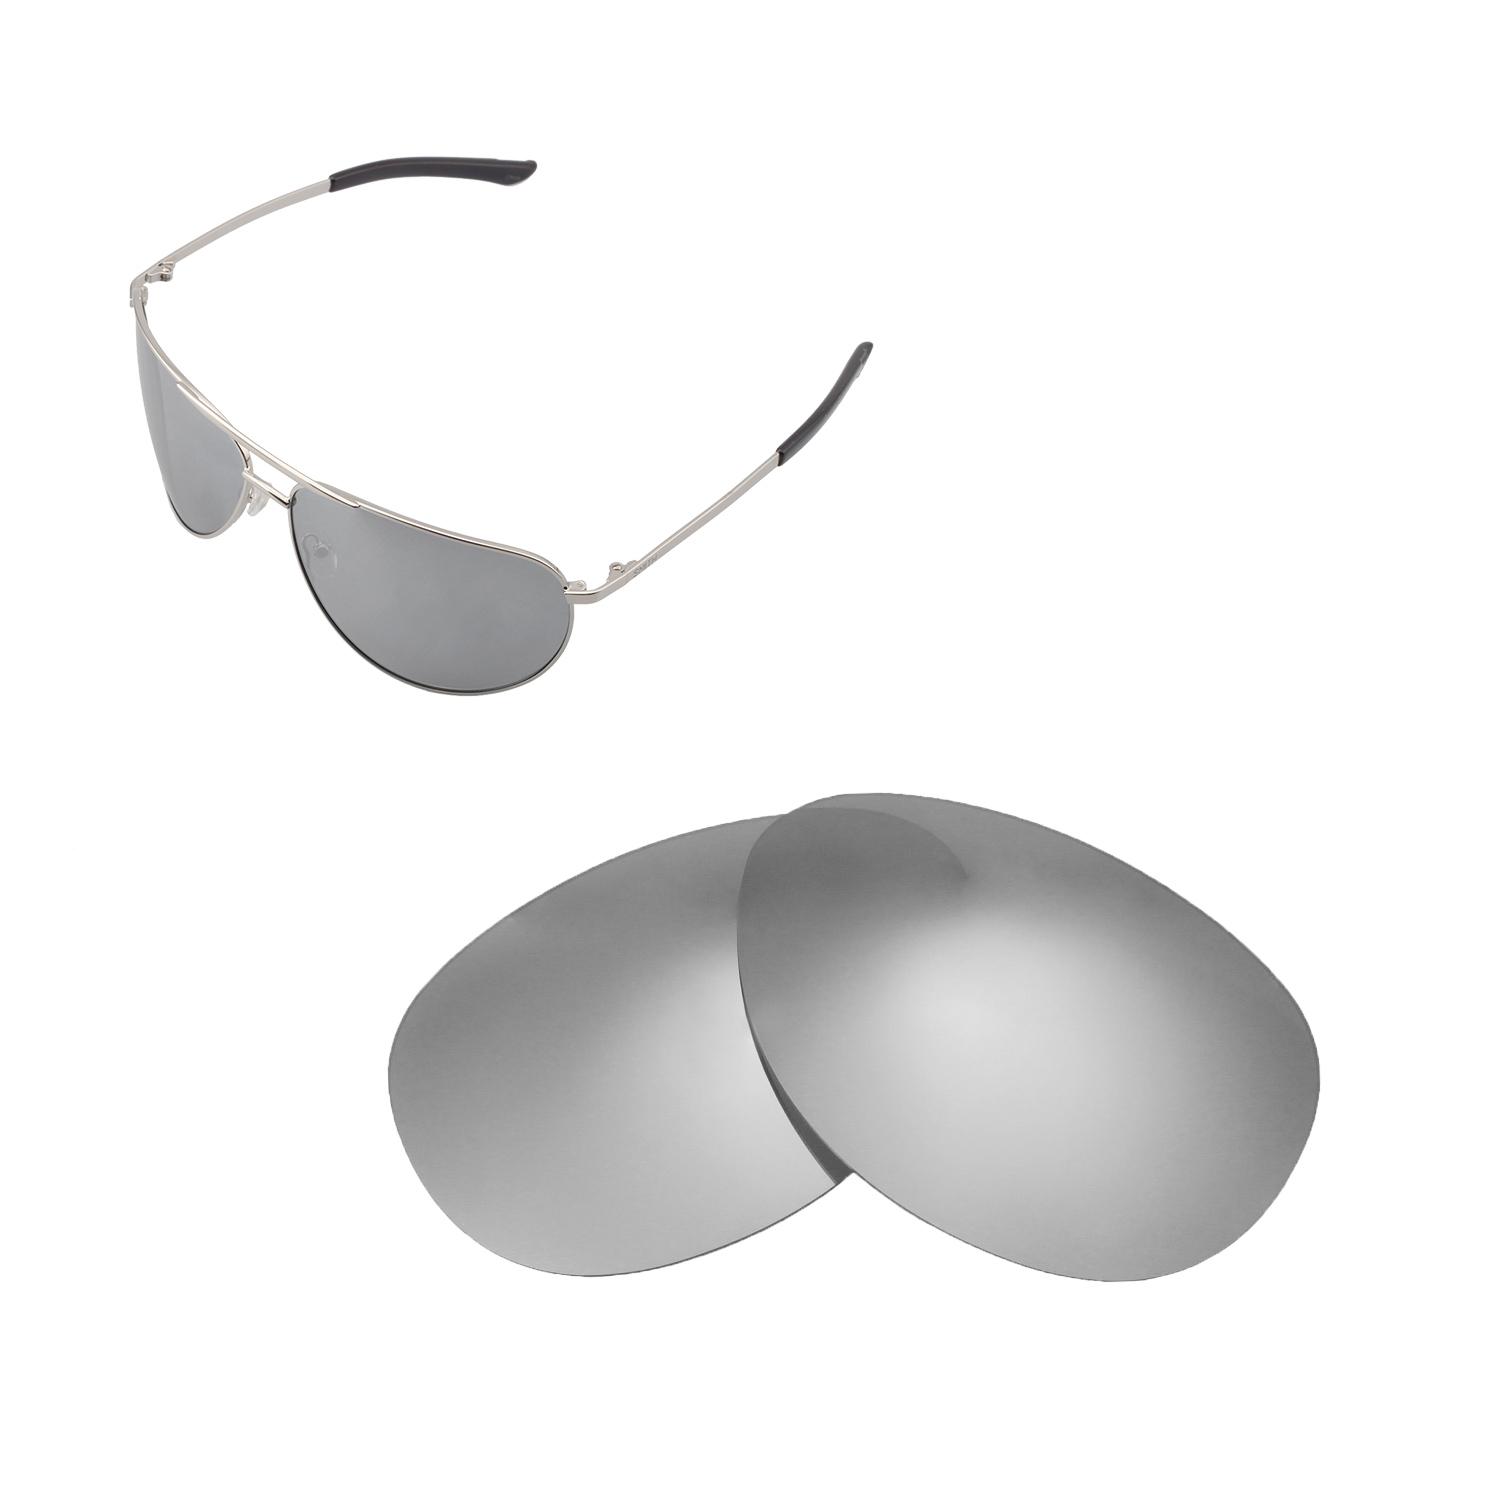 1a7fe1ebf0c Details about New Walleva Titanium Polarized Replacement Lenses For Smith  Serpico Sunglasses